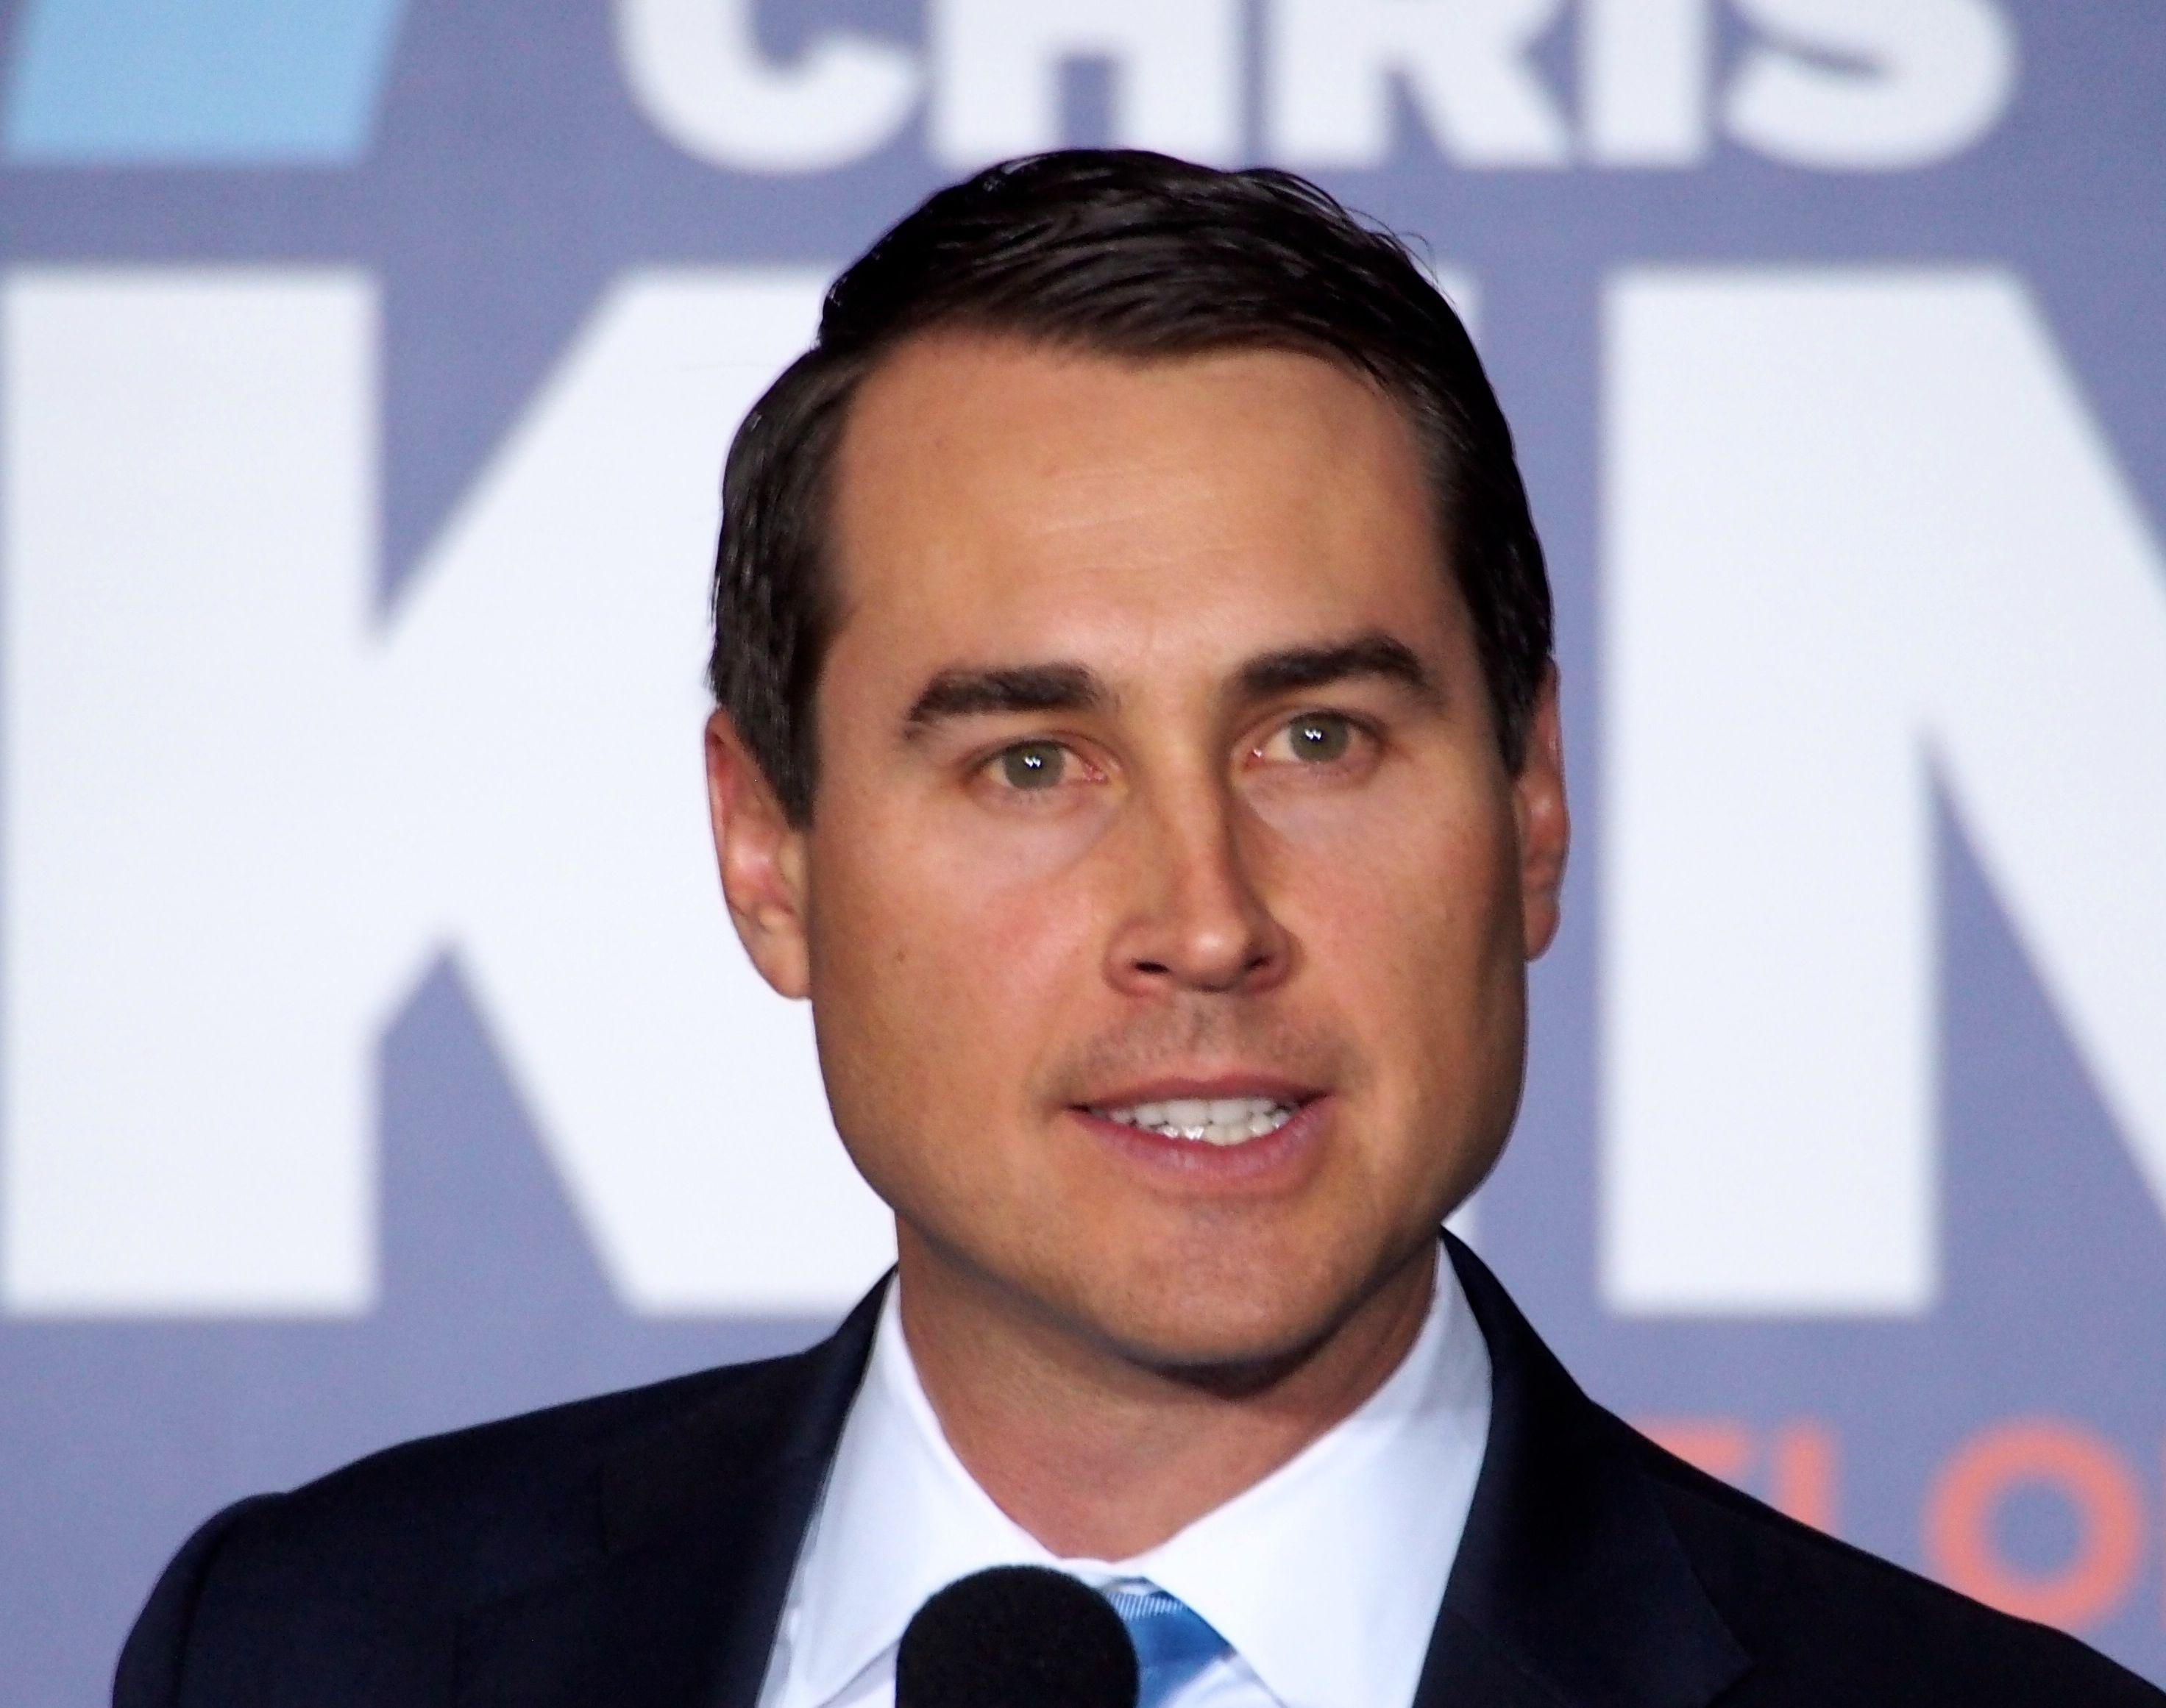 Chris-King-3.jpg